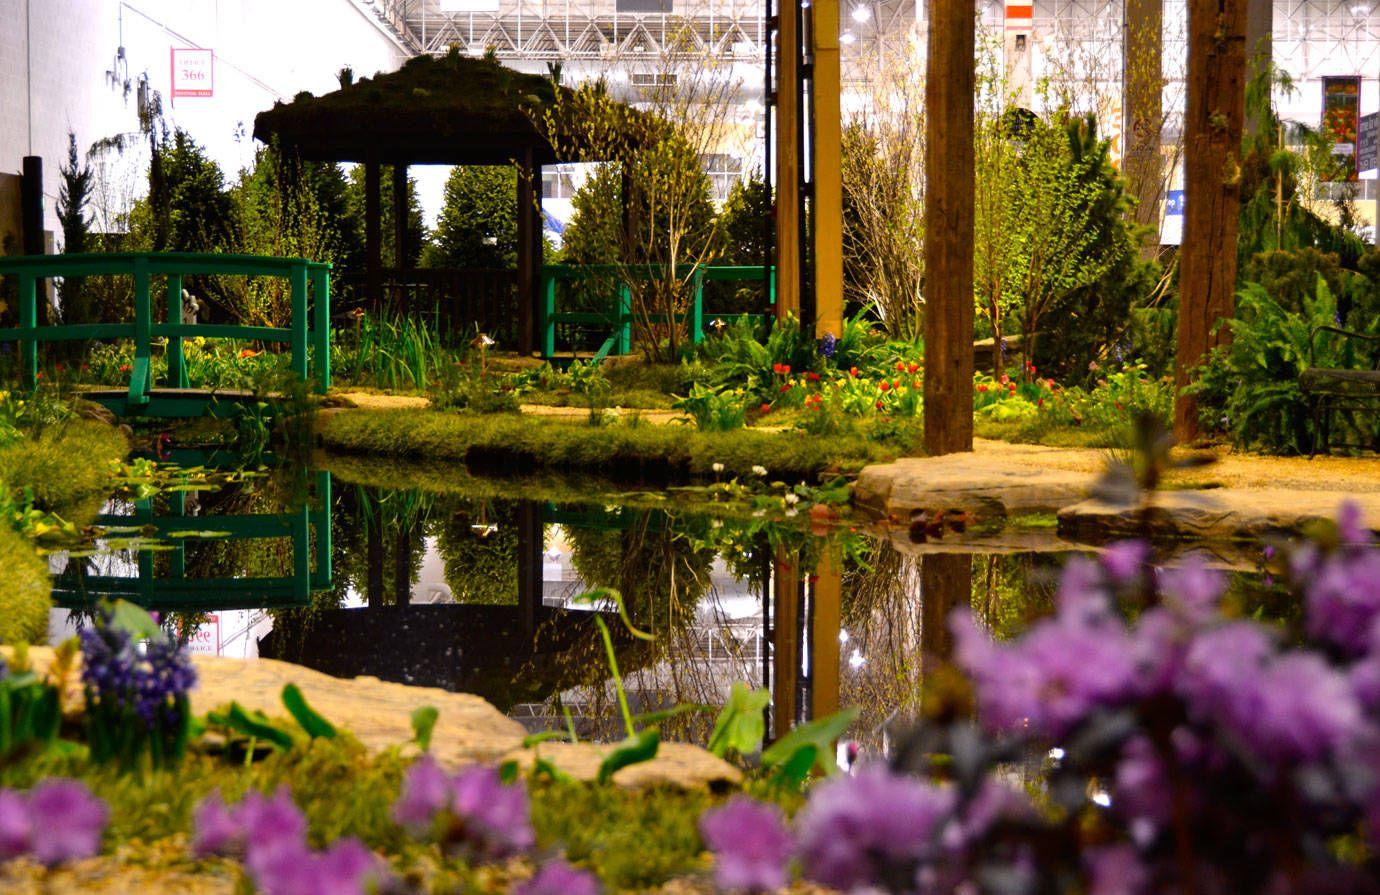 Interior-New York Botanical Garden Orchid Show